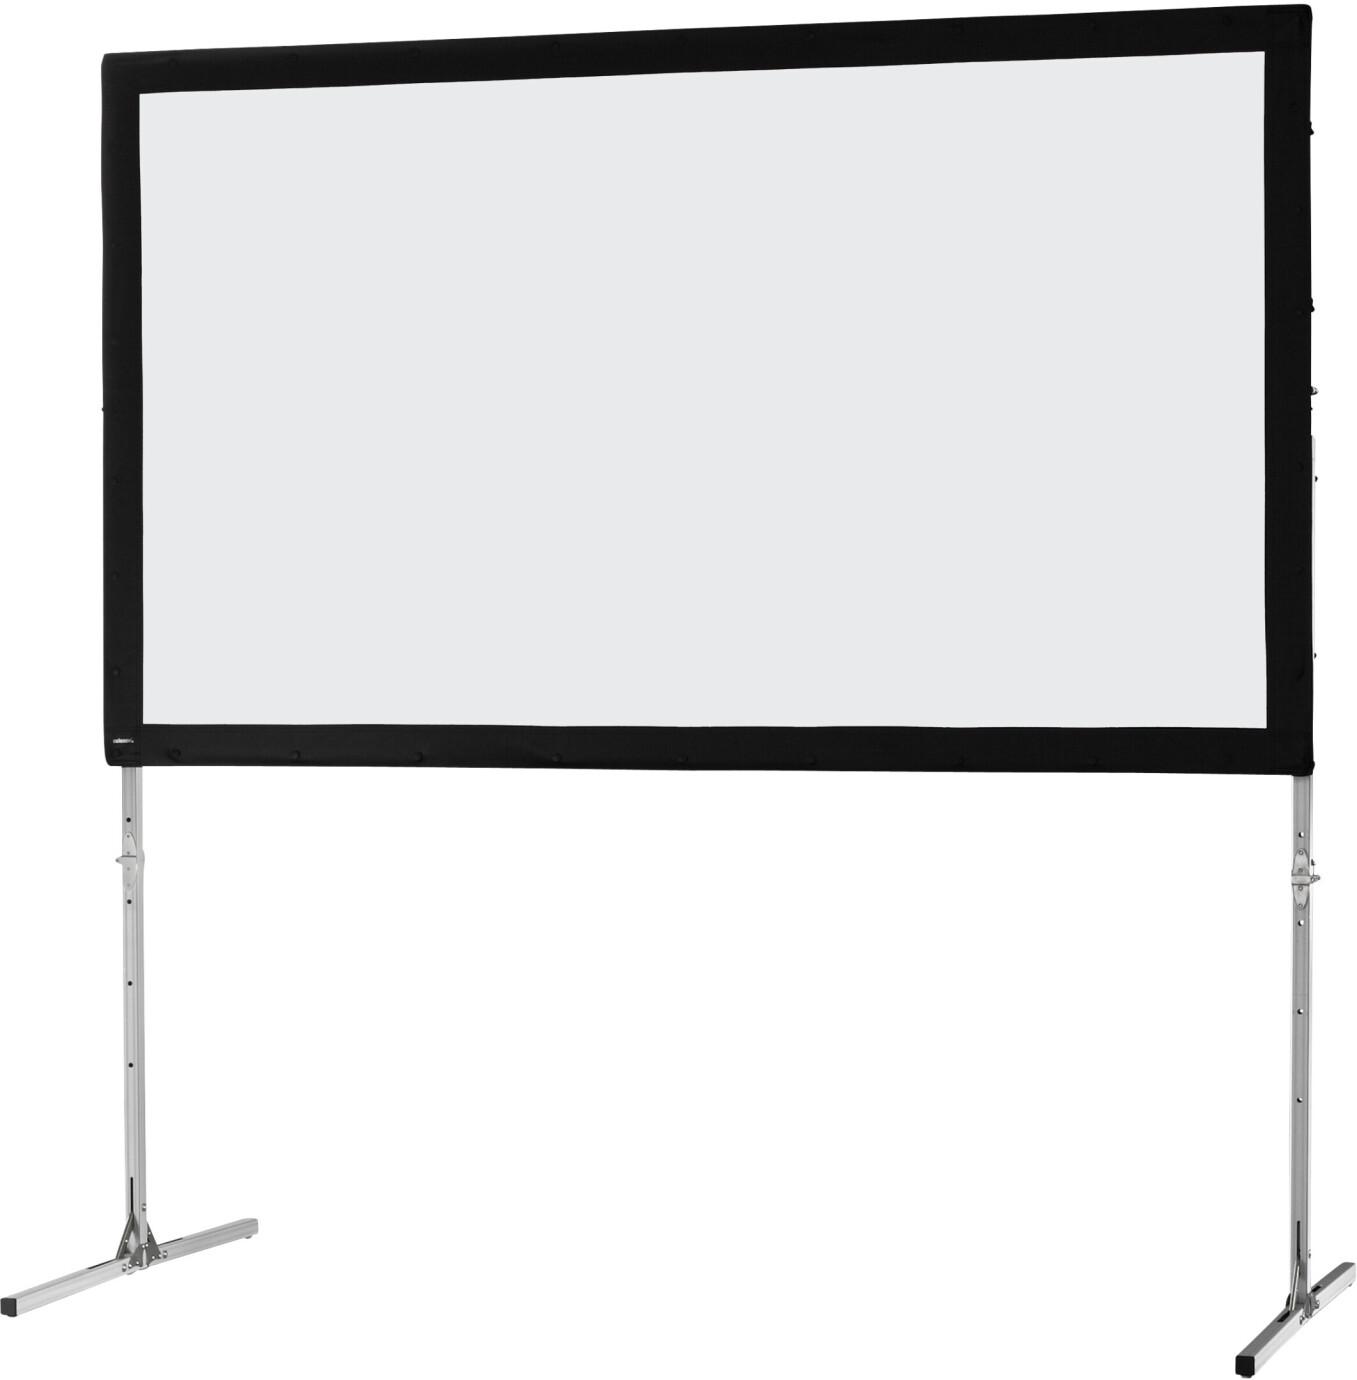 celexon Faltrahmen Leinwand Mobil Expert 366 x 206cm, Frontprojektion